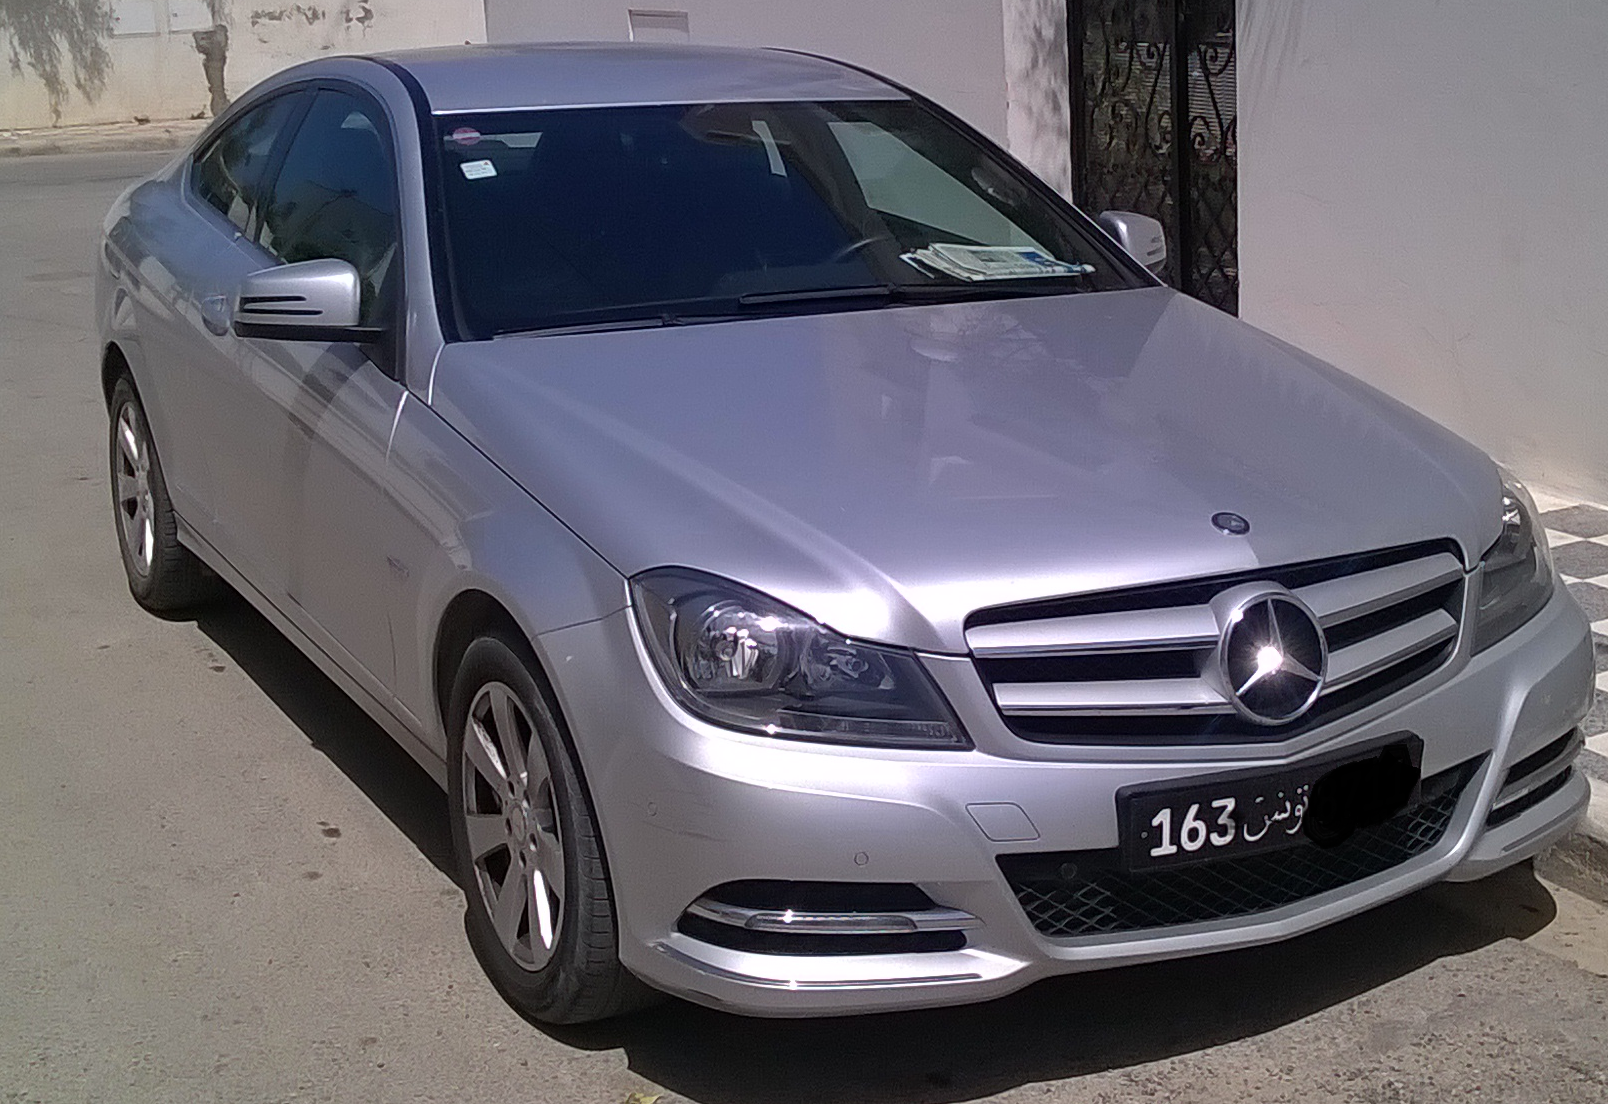 mercedes classe c rf150519220554 tunis prix 63000000 tnd 44000 km 12012 diesel automatique - C Tunisie